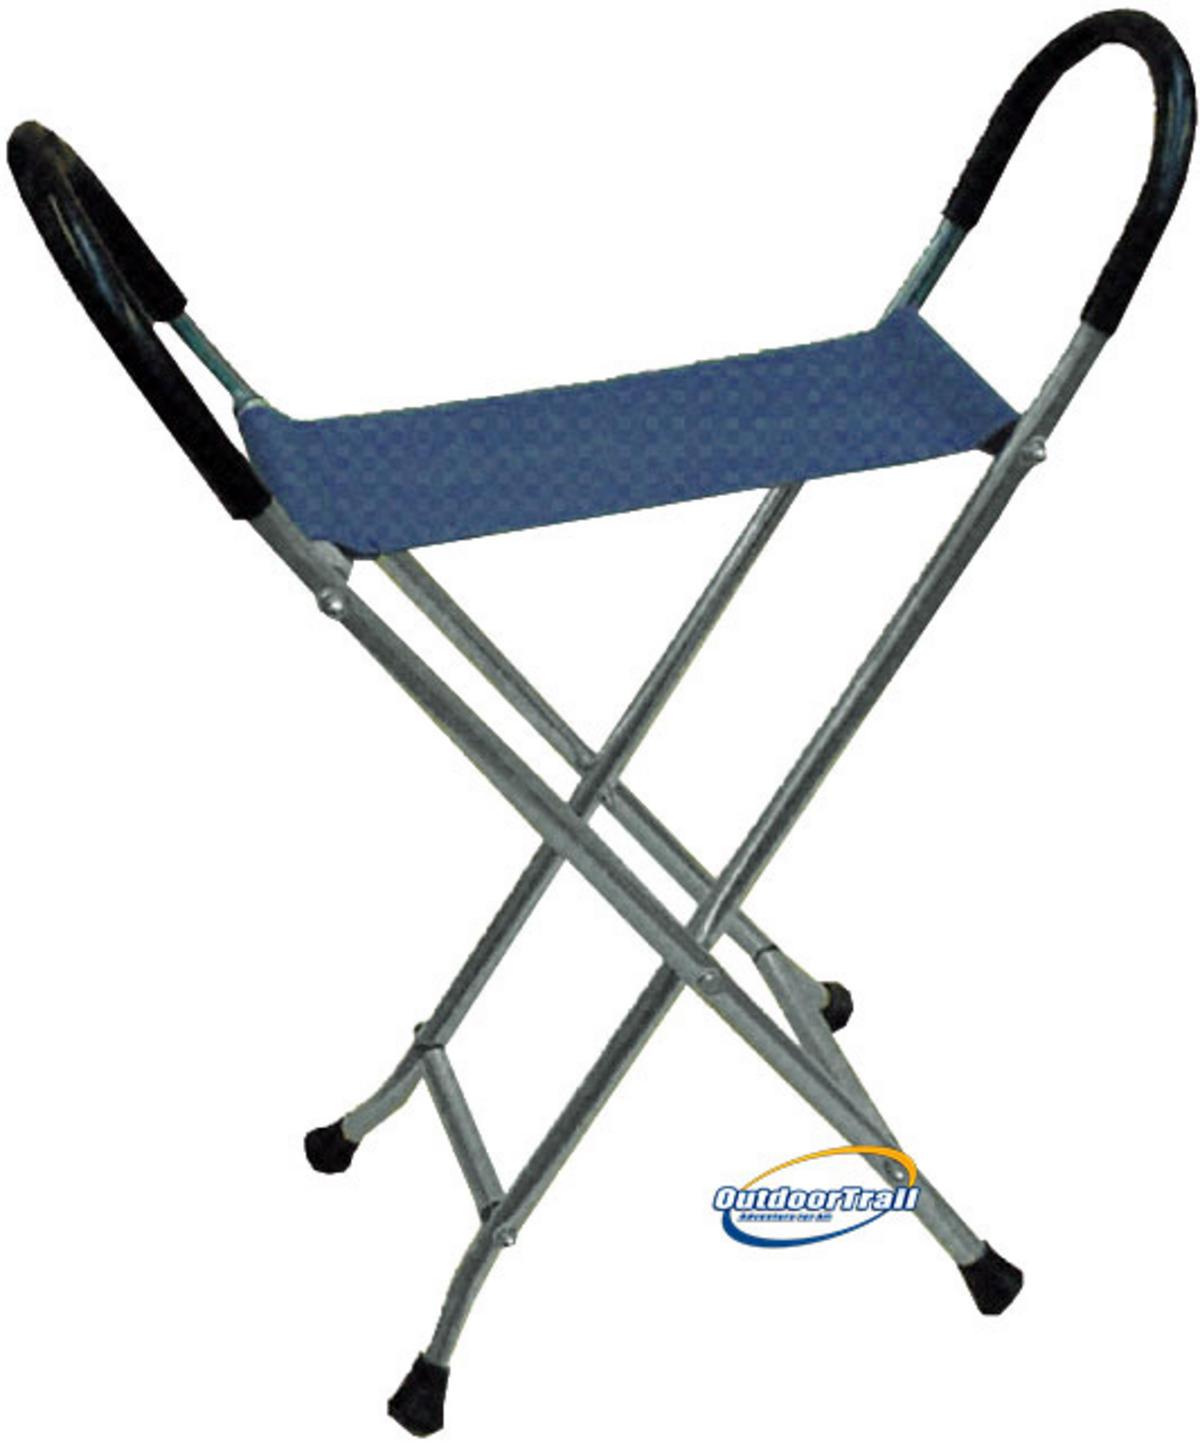 Folding Alloy Walking Stick Chair Outdoor Trail Ltd